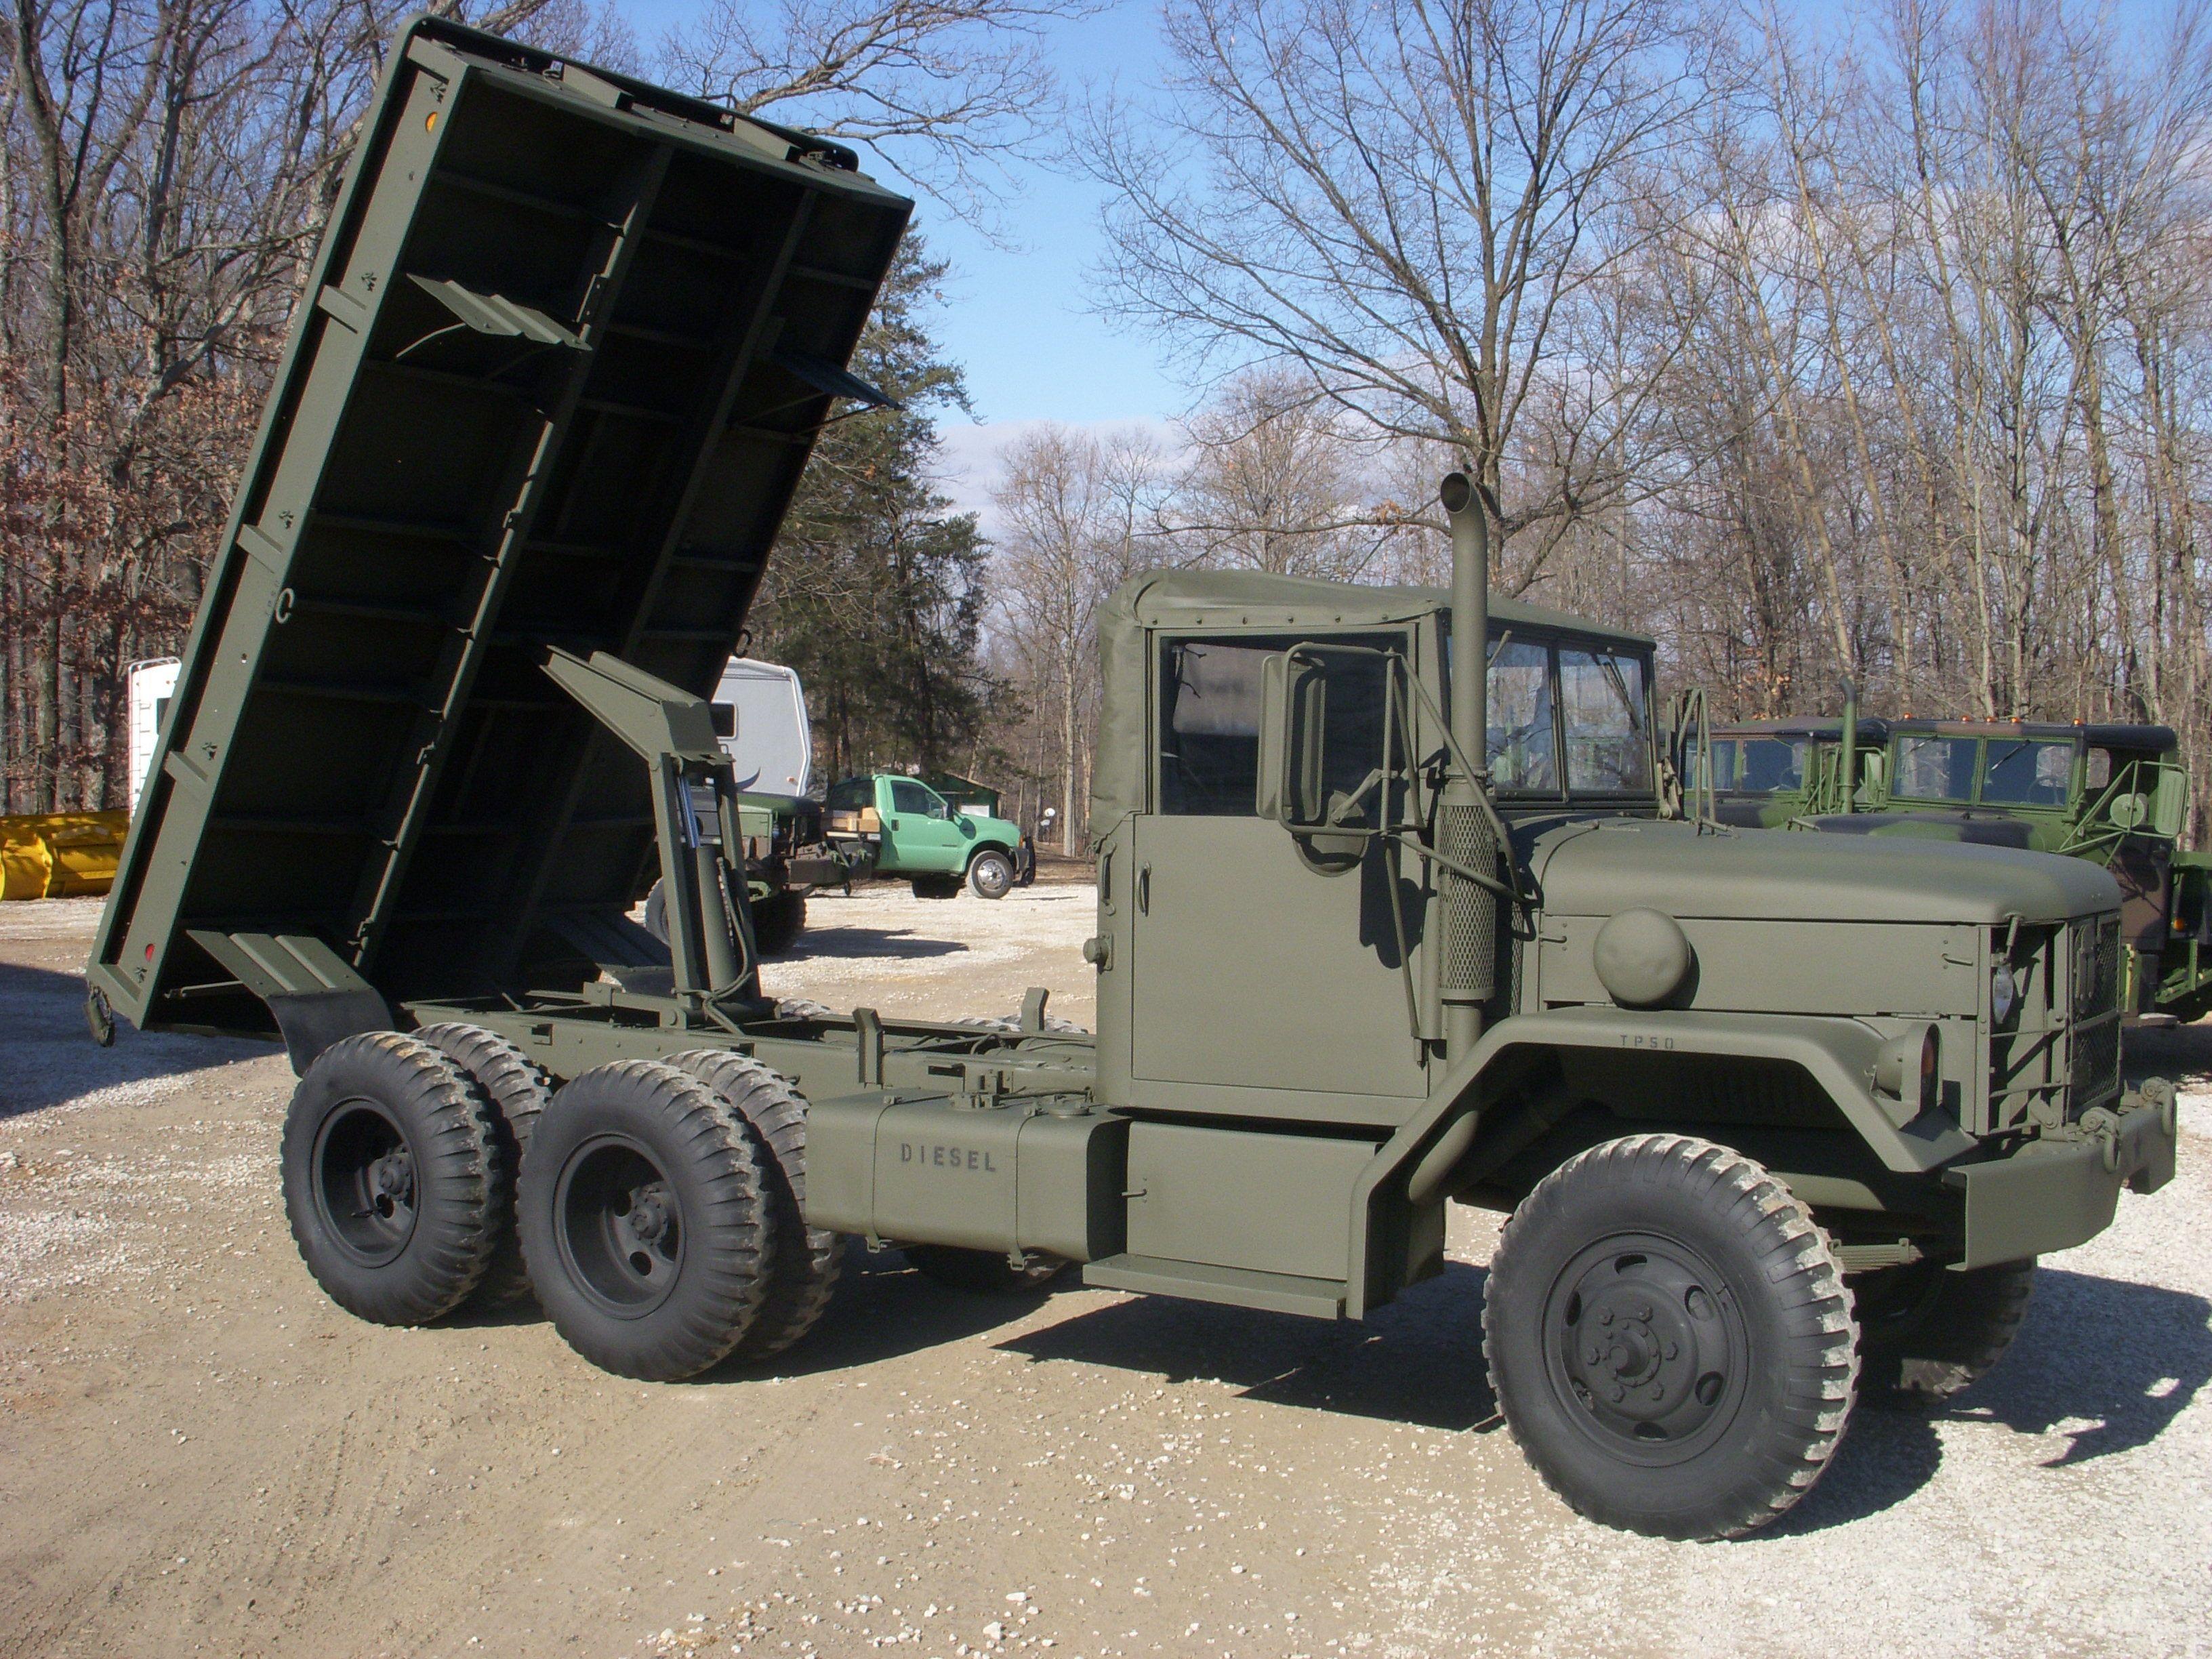 6x6 2 5 ton custom dump bed | Military Cargo Trucks | 6x6 truck